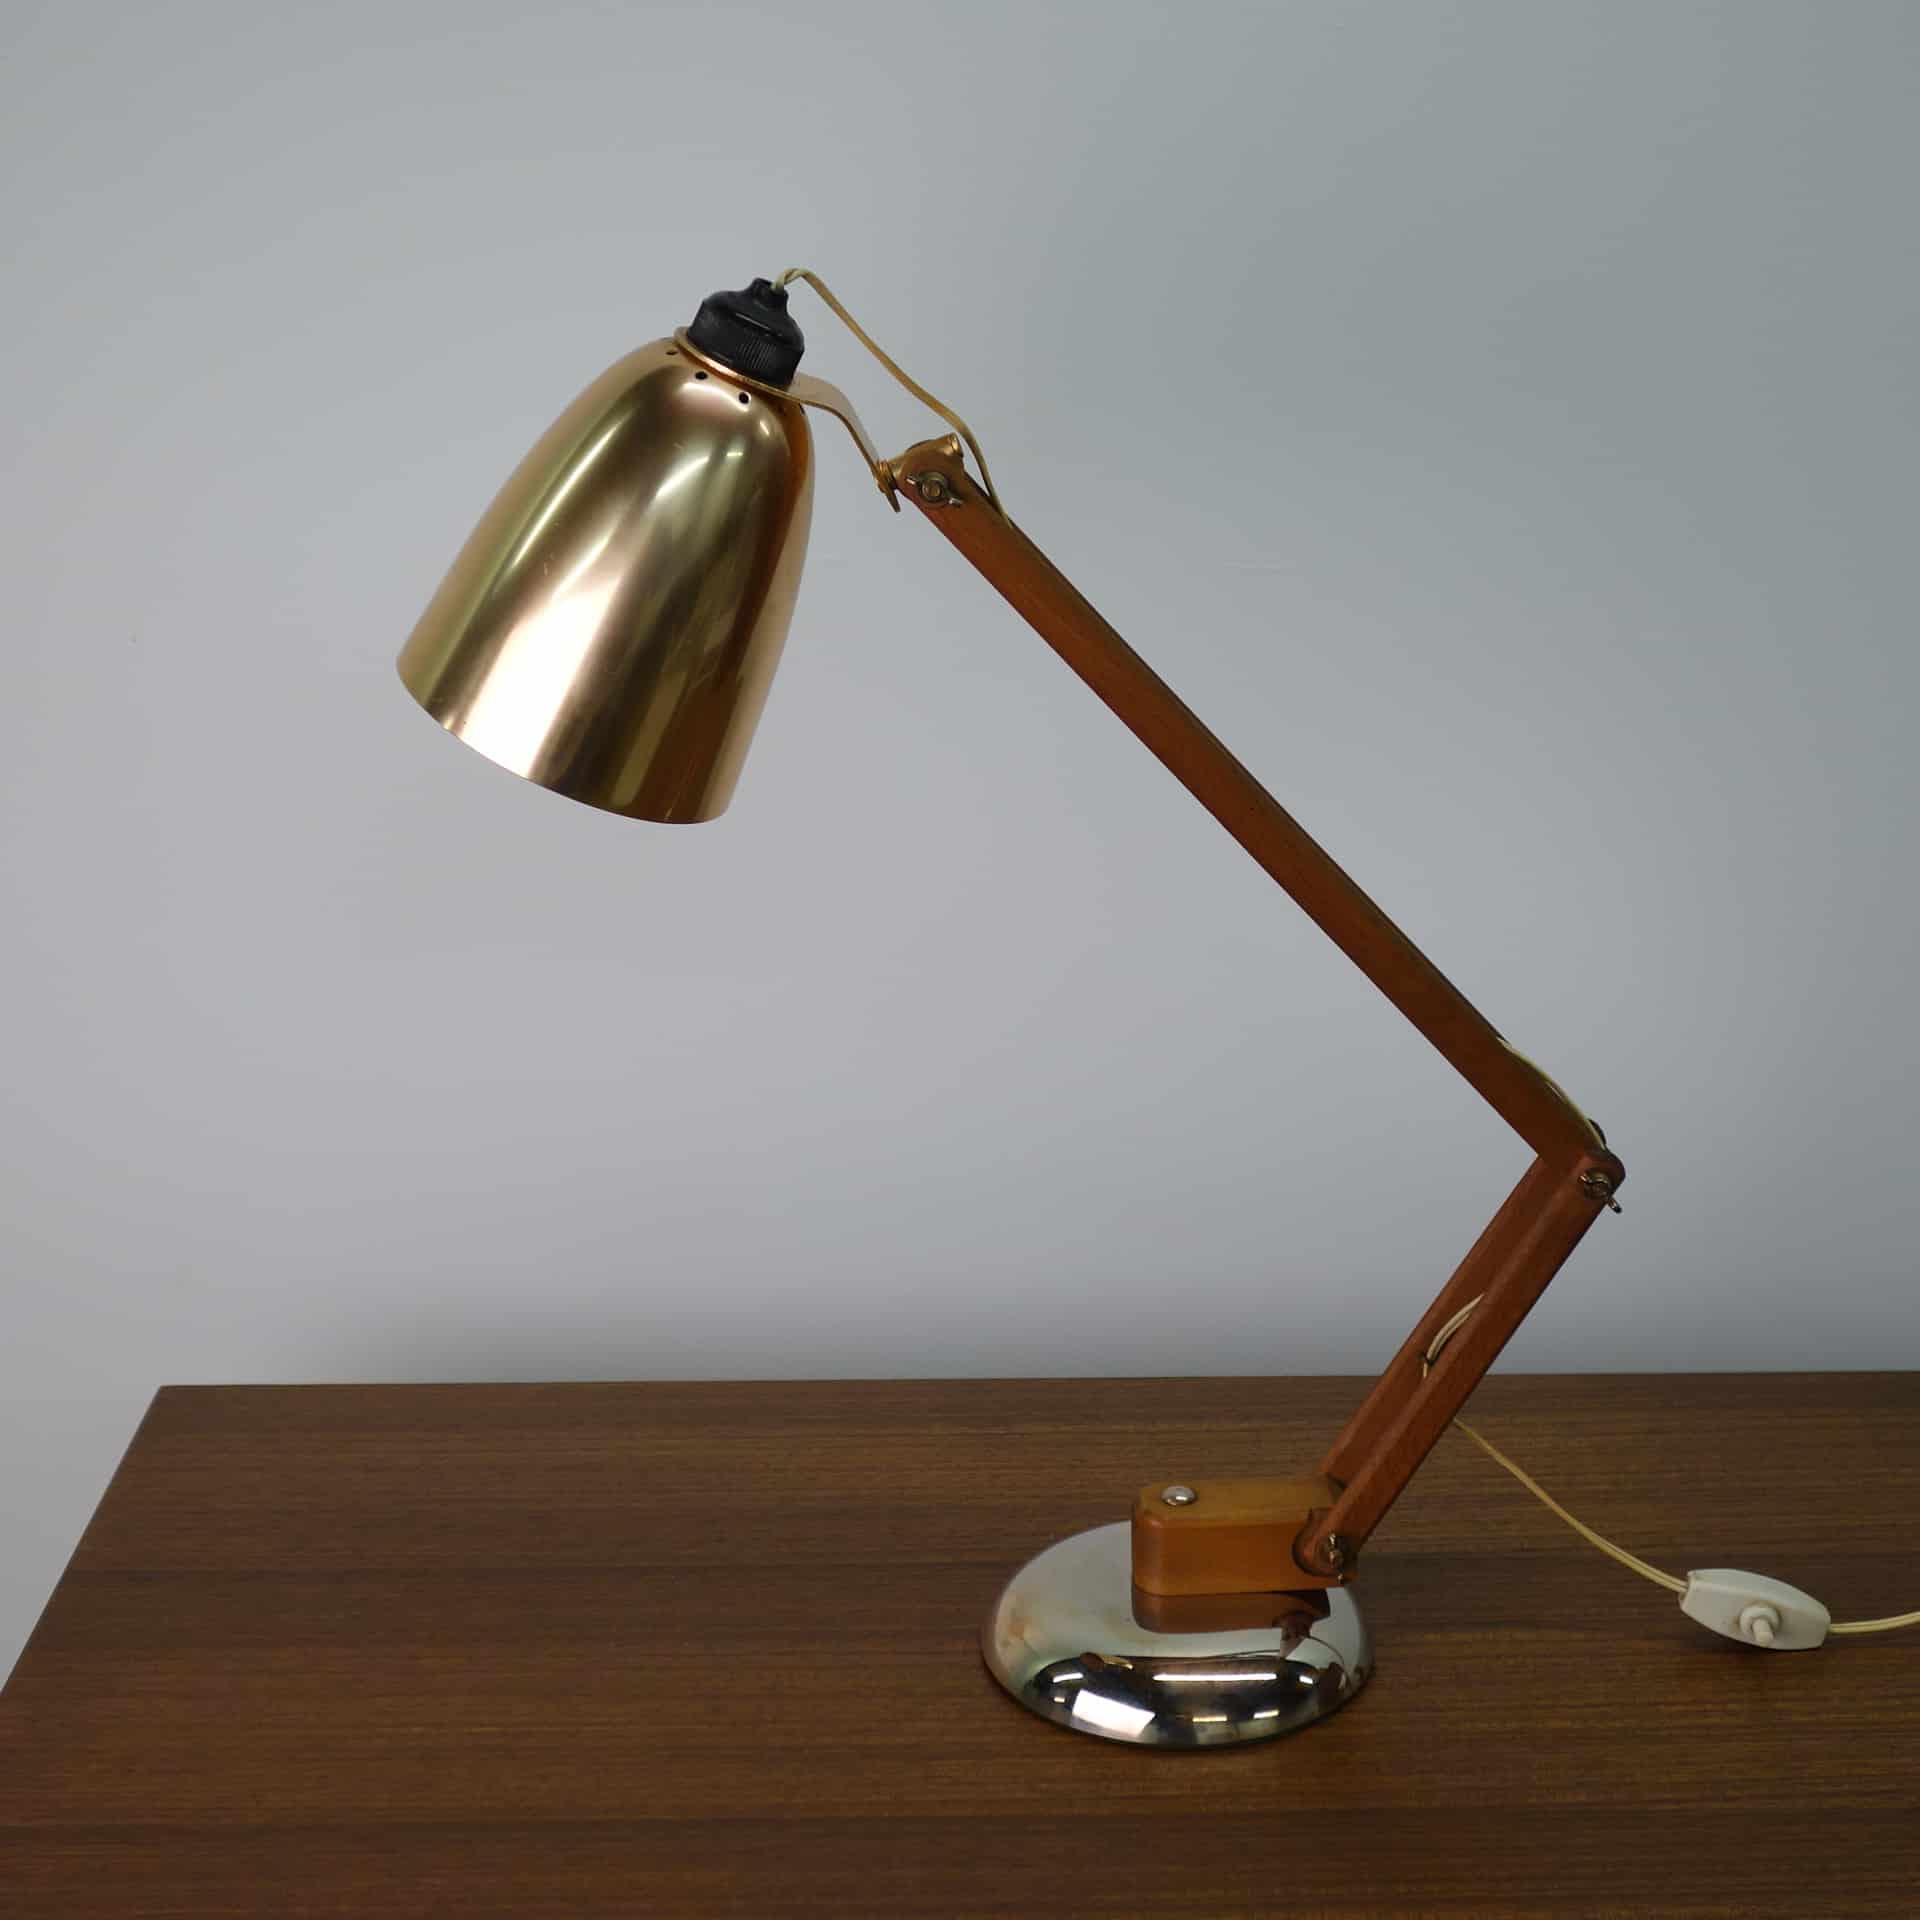 1960s copper adjustable desk light by Maclamp